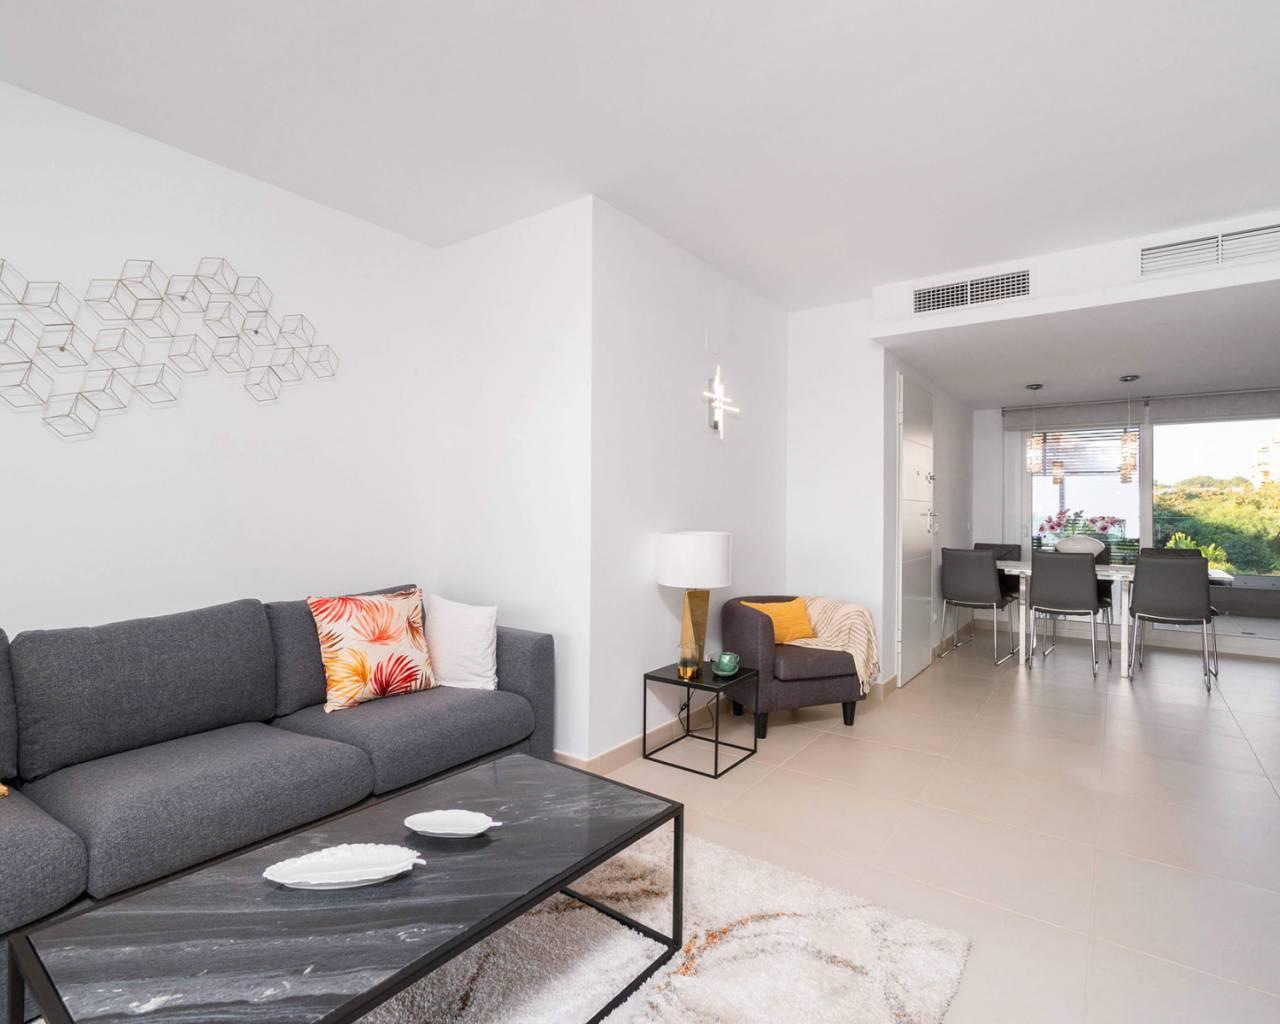 nieuwbouw-appartement-torrevieja-punta-prima_2902_xl